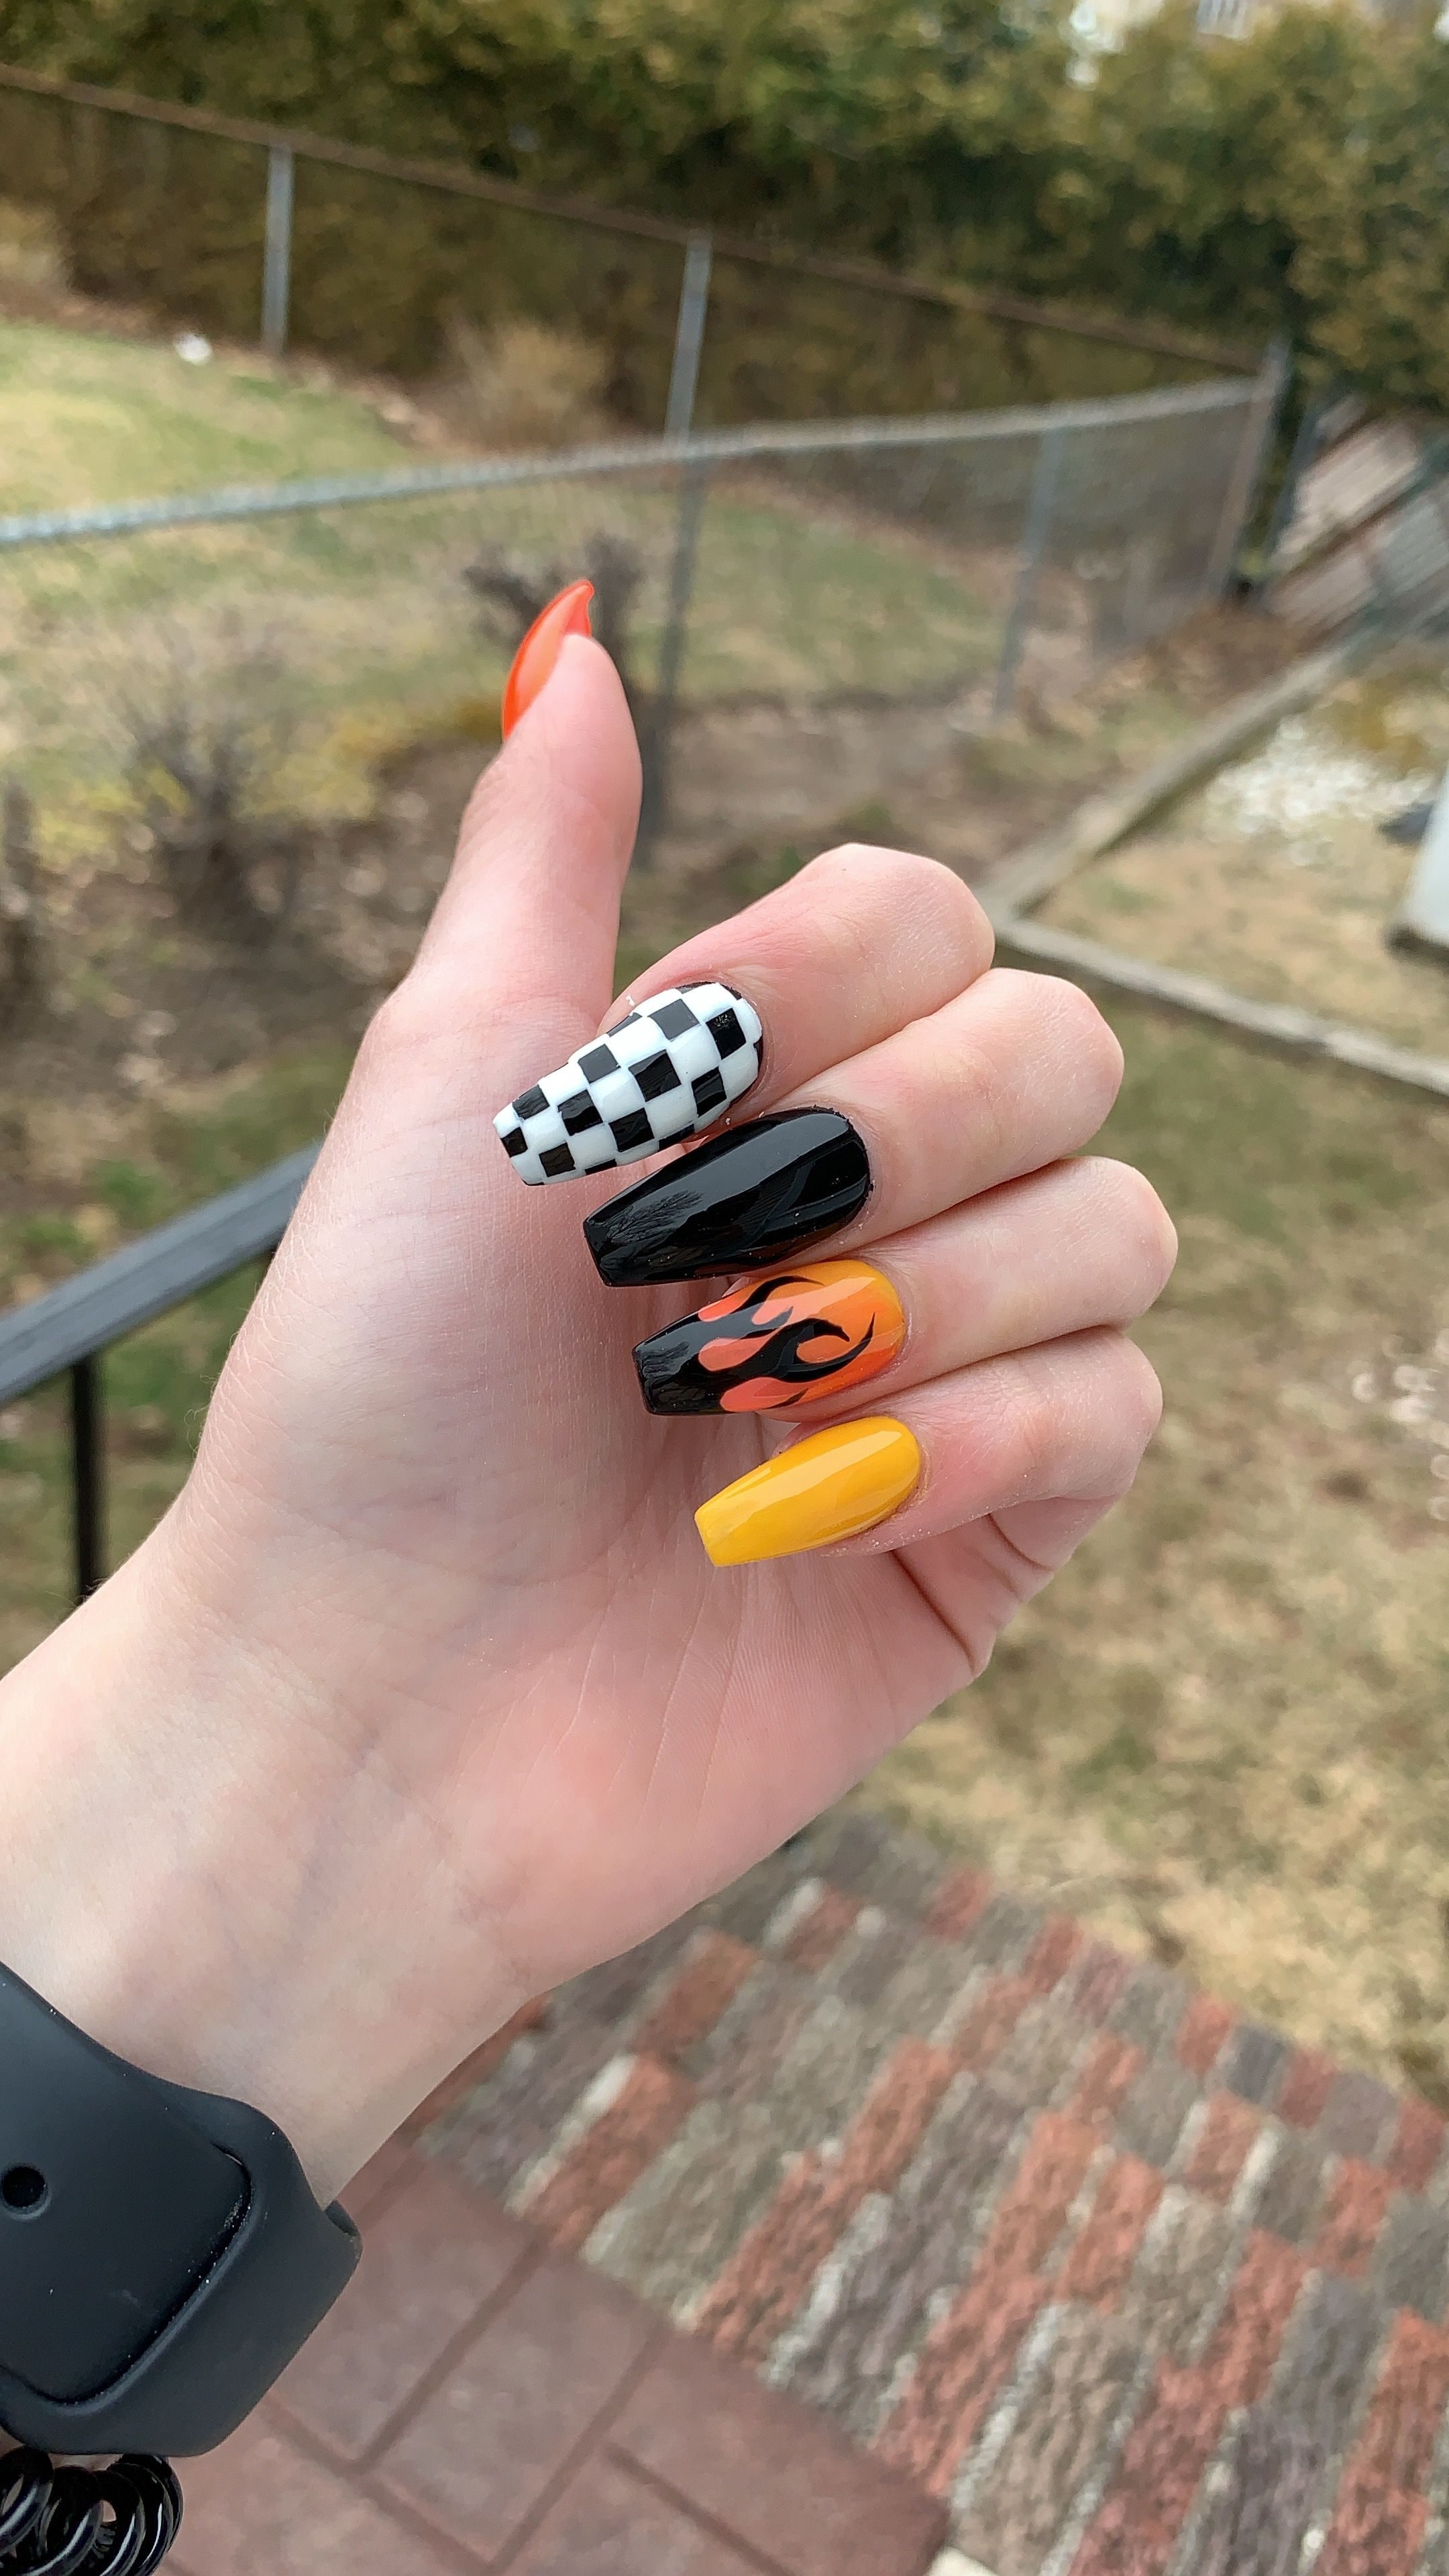 Firenails Checkered Acrylic Orange Nails Checkered Nails Orange Nails Fire Nails